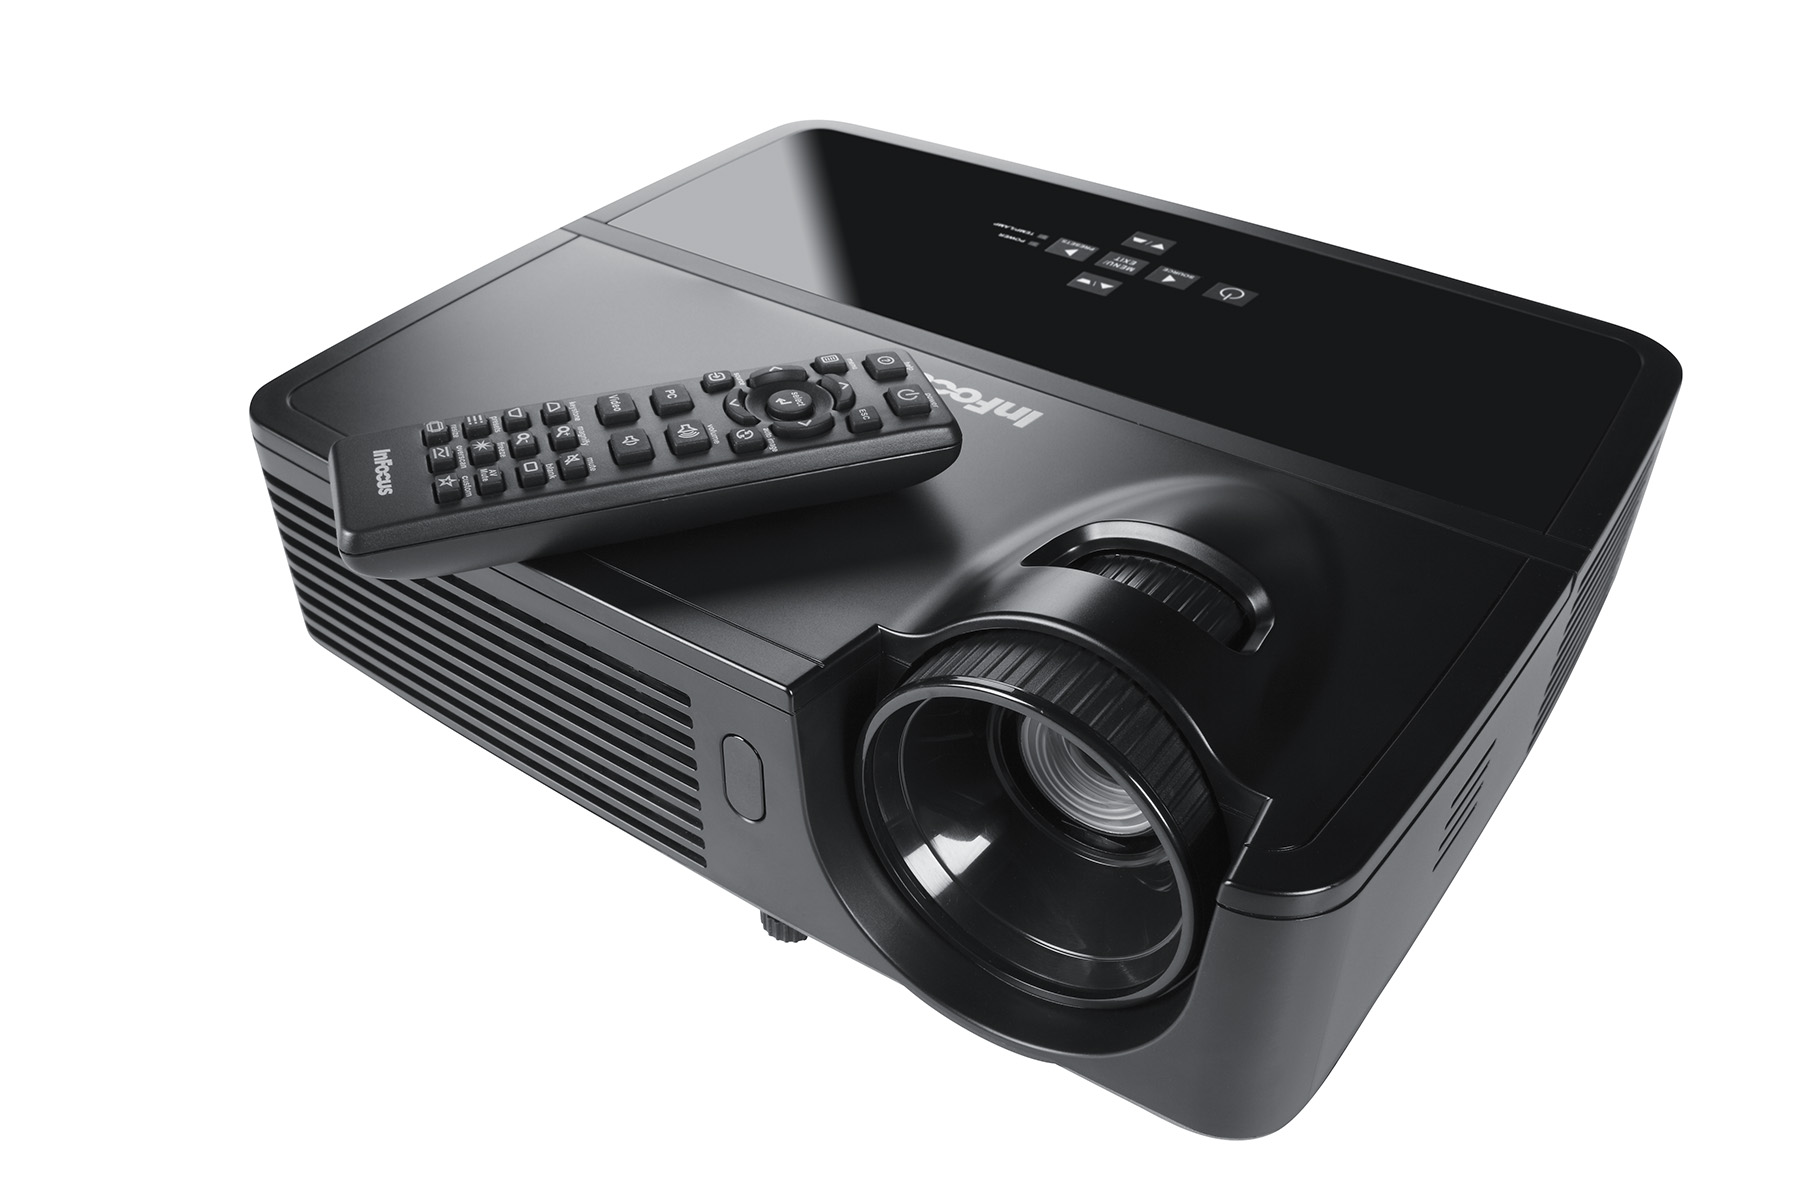 Infocus Projektoren In112 Svga Dlp Beamer Cus Projector In224 Hdmi Projektor